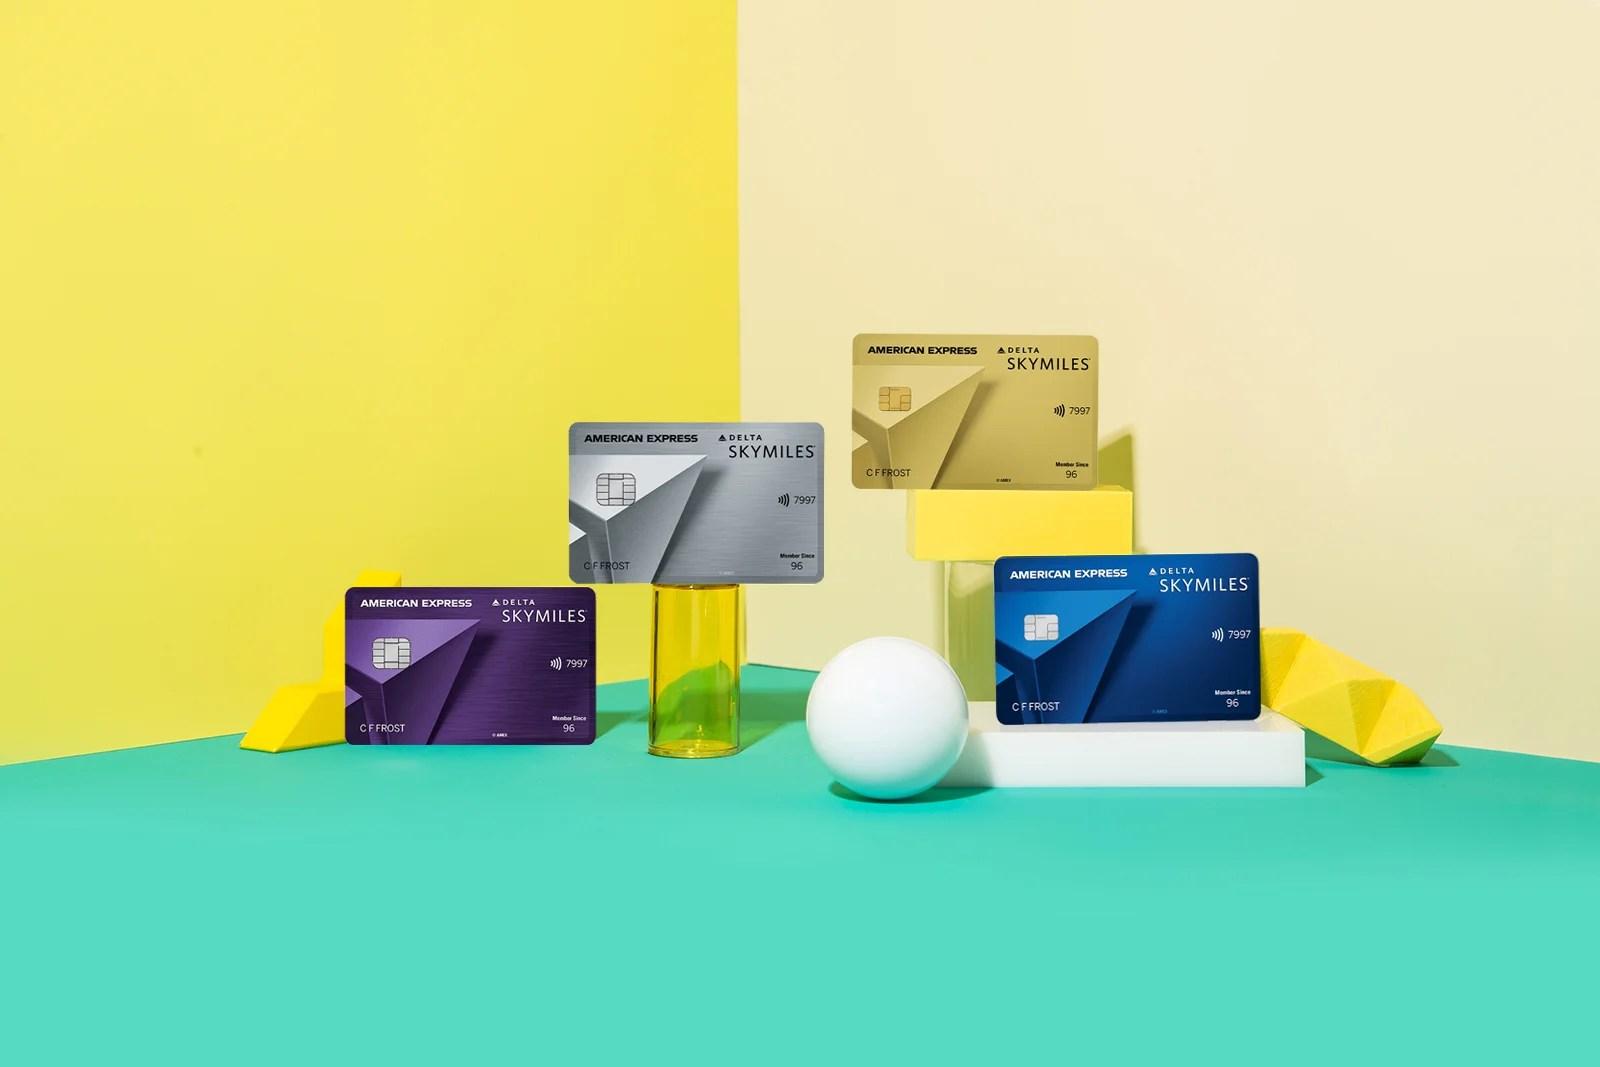 credit one bank credit card support банковский кредит предусматривает